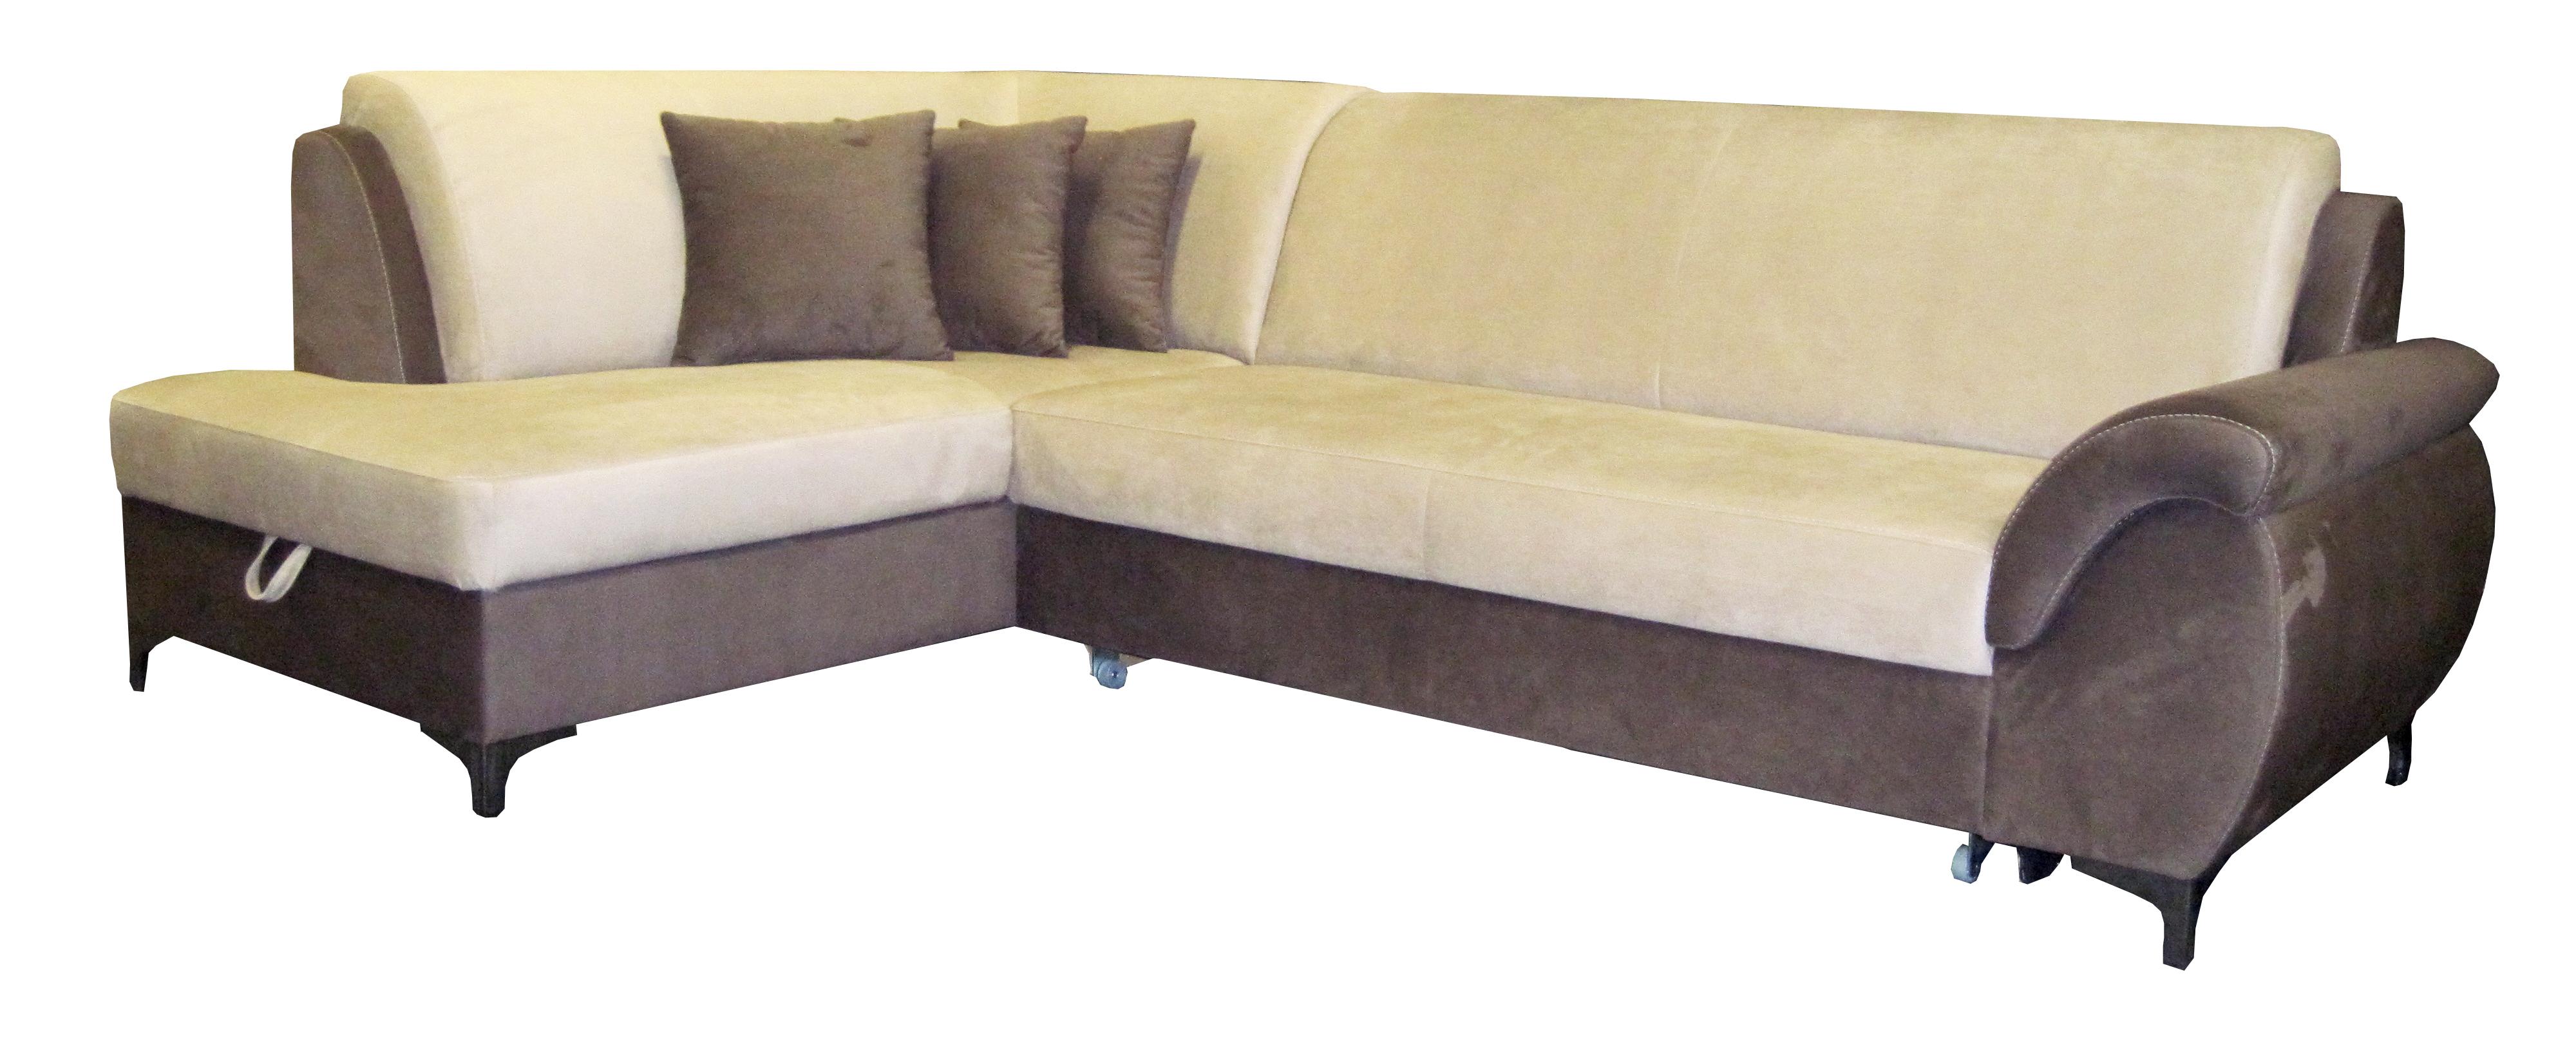 Rohová sedačka - BRW - Bruce RECBK.2F hnedá (L)